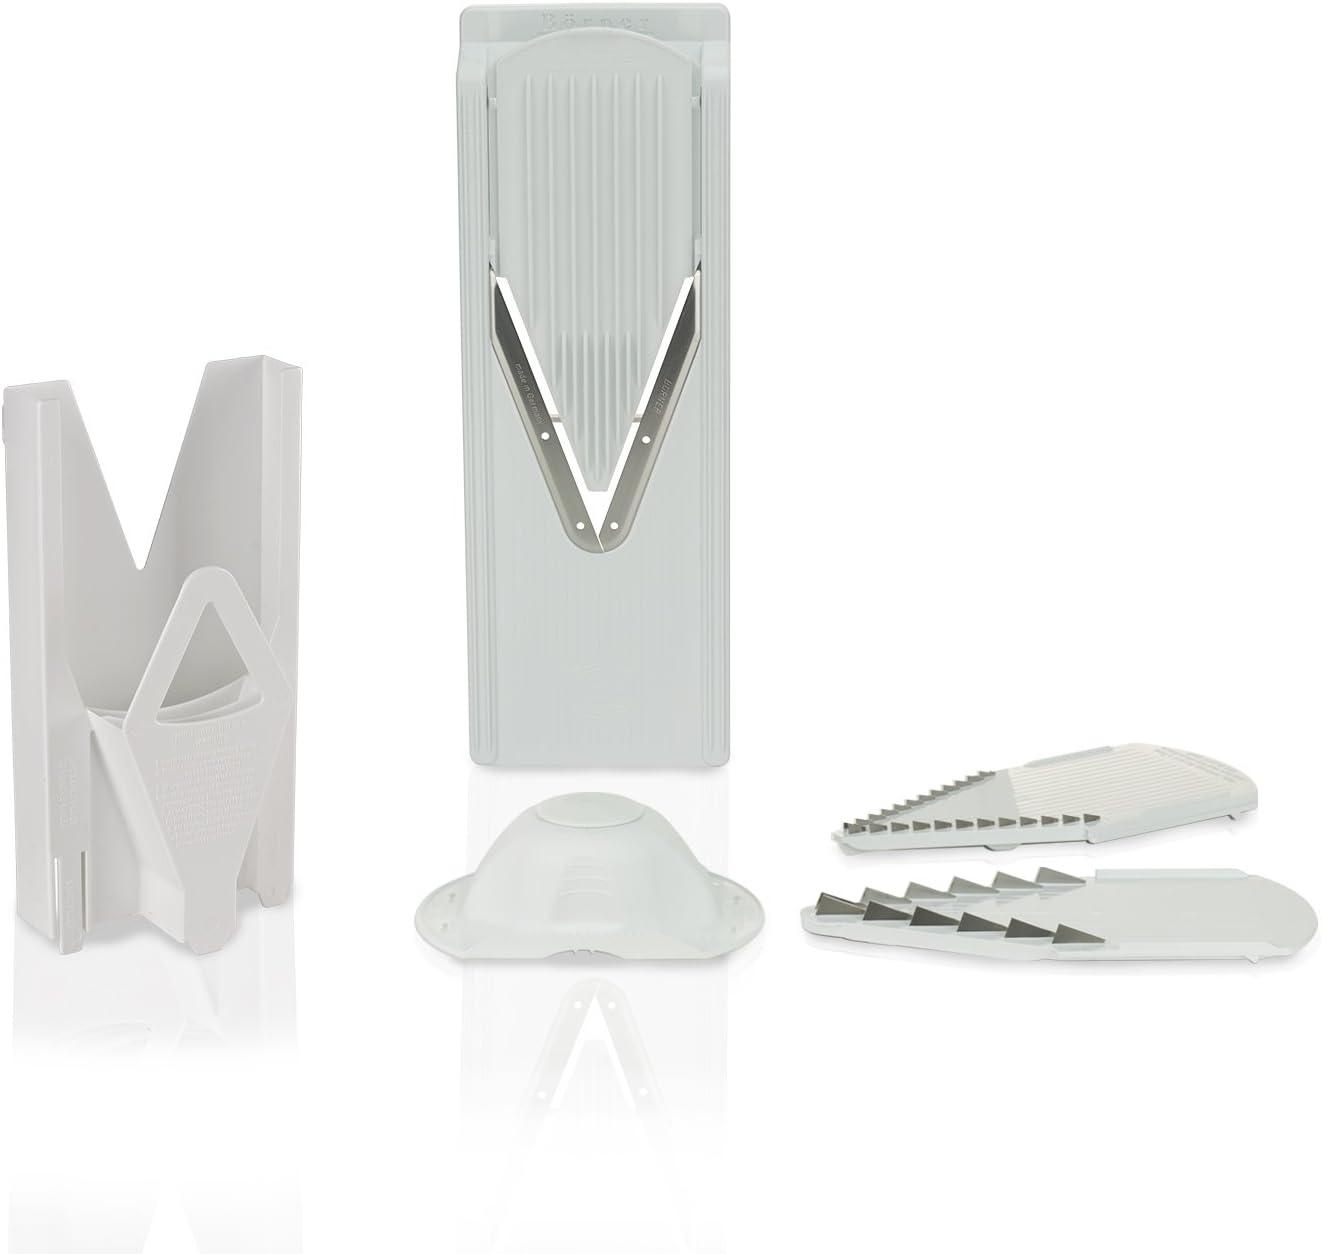 Original Borner V3 TrendLine fruit- and vegetable slicer (including slide insert and blade inserts 3,5mm and 7mm) with safety food holder and multi-box for storage. (White)